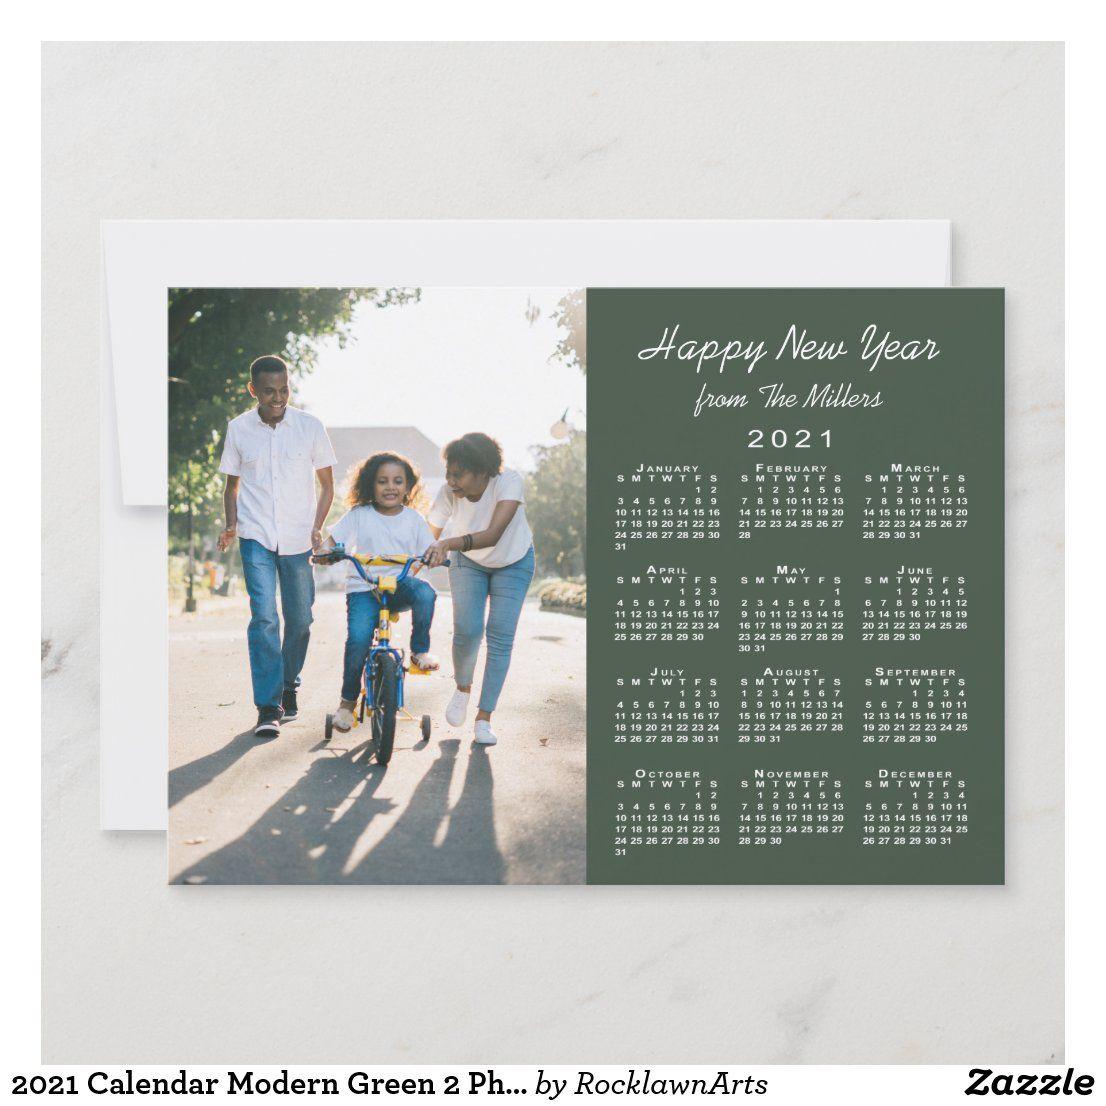 2021 Calendar Modern Green 2 Photo Happy New Year Holiday